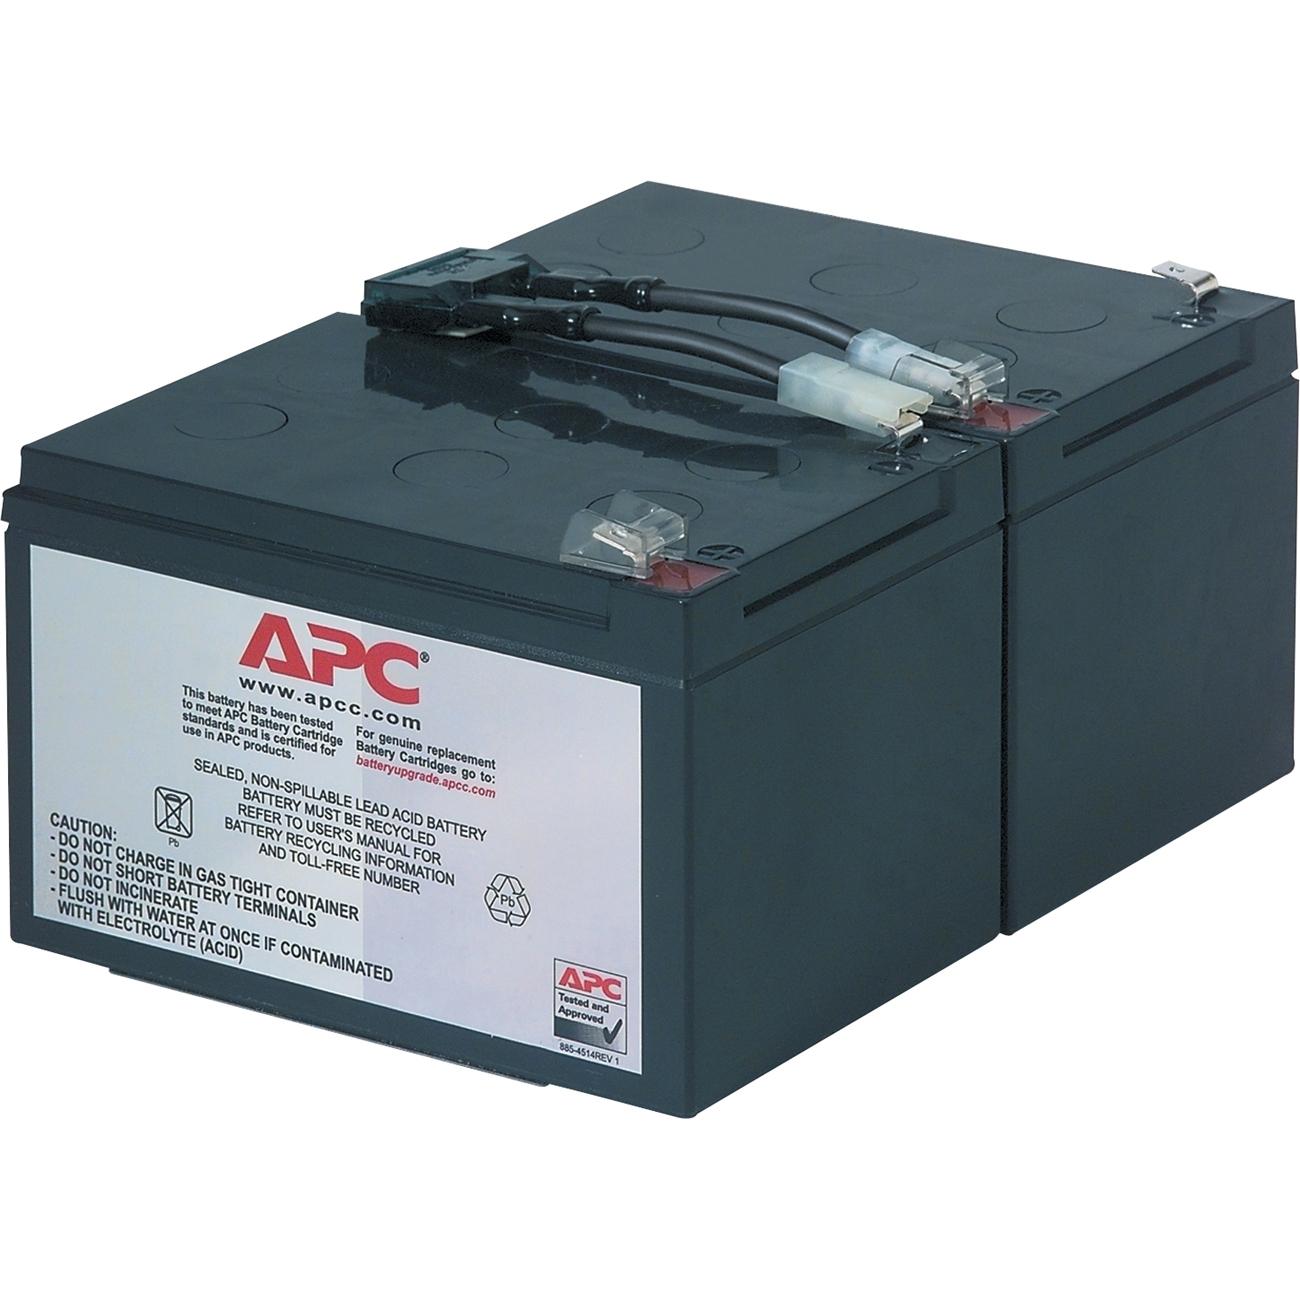 APC Replacement Battery Cartridge #6 For BP1000 SU1000 RBC6